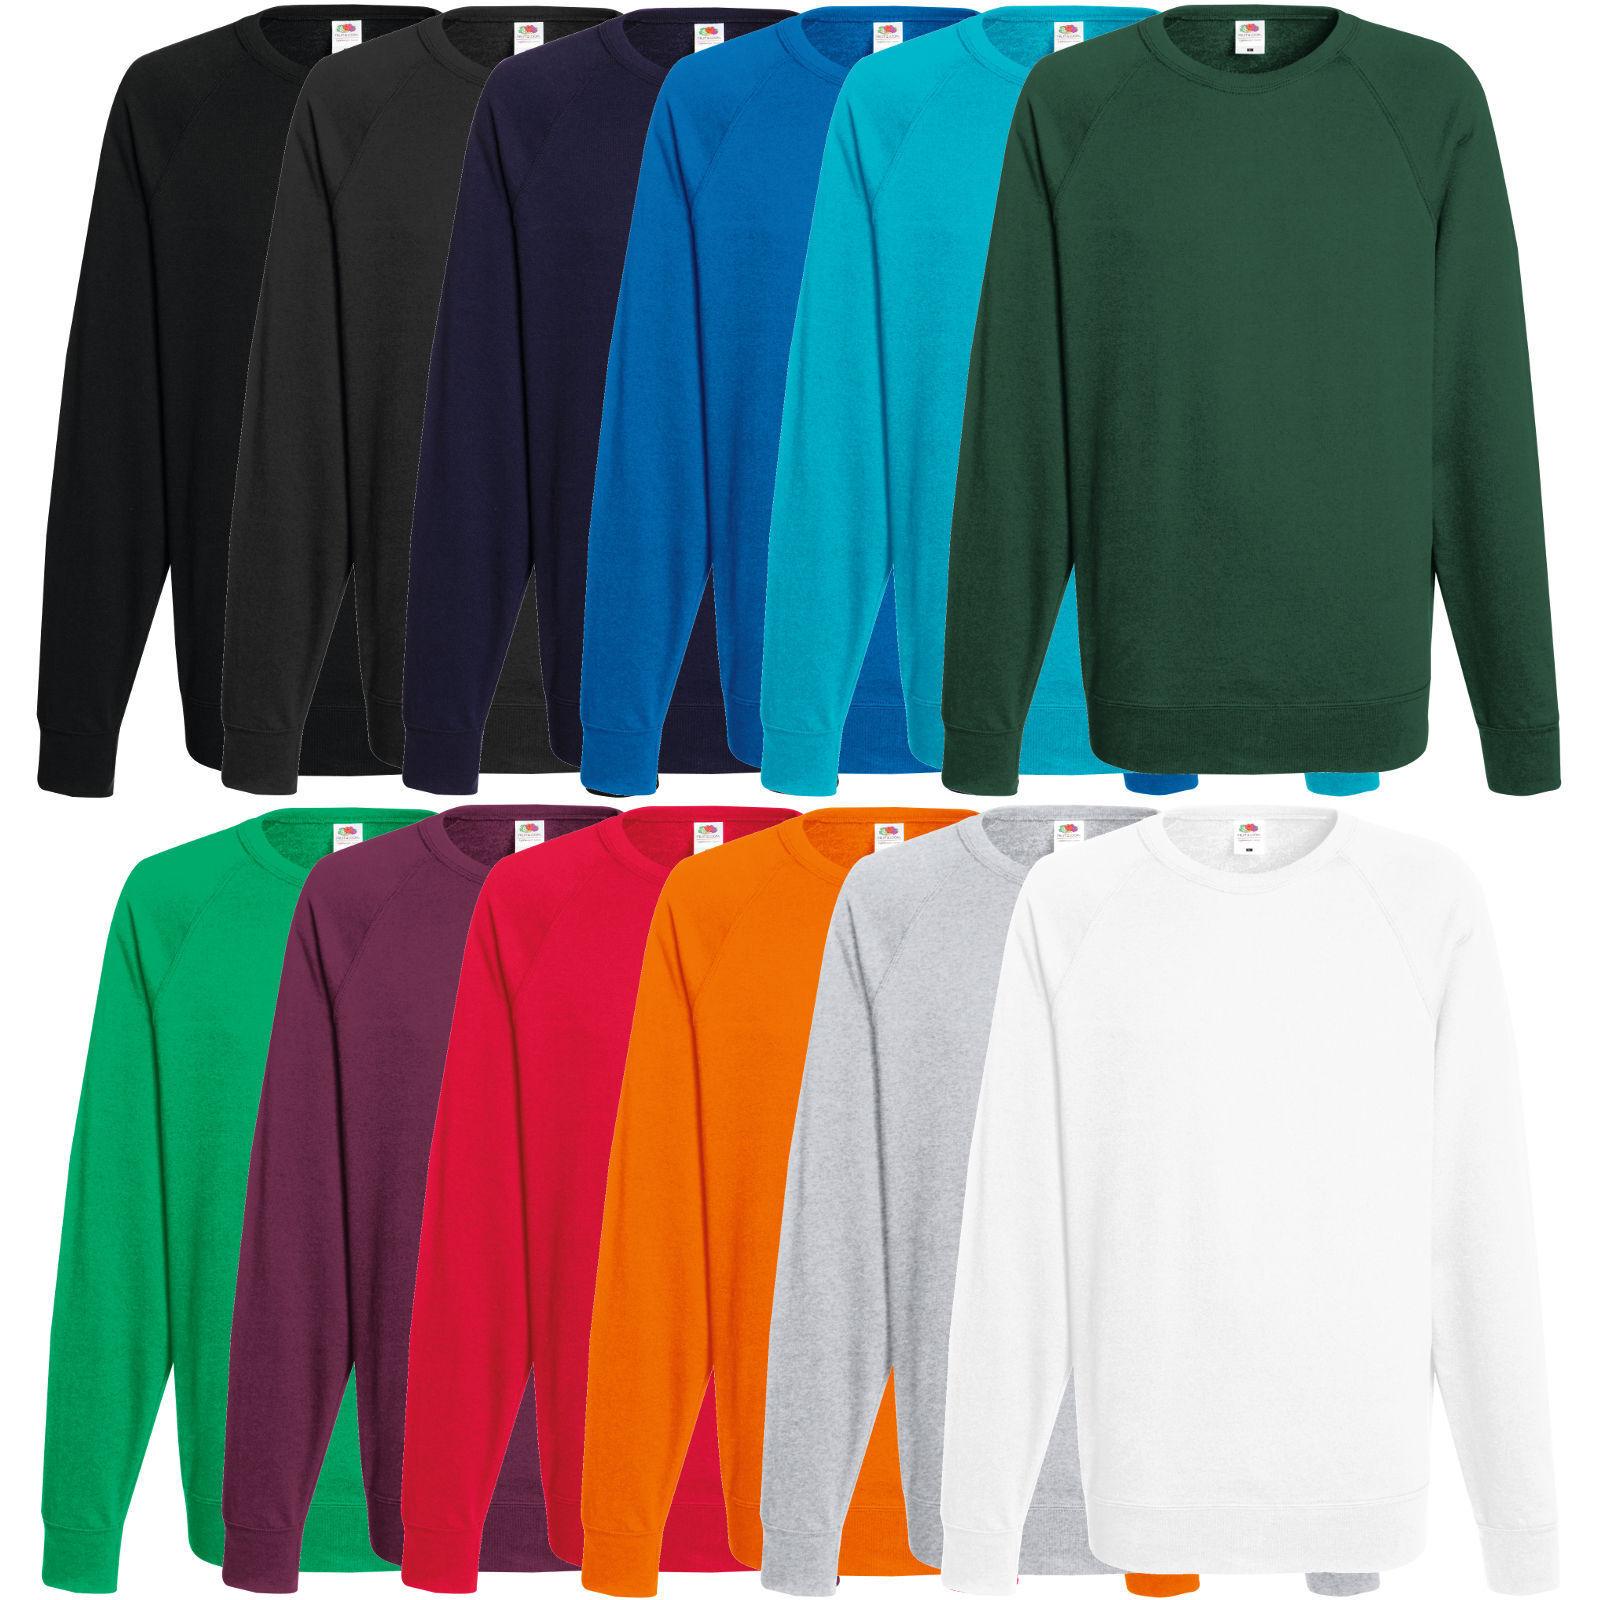 Fruit of the Loom Herren Pullover Sweatshirt Pulli Shirt Jacke S M L XL XXL